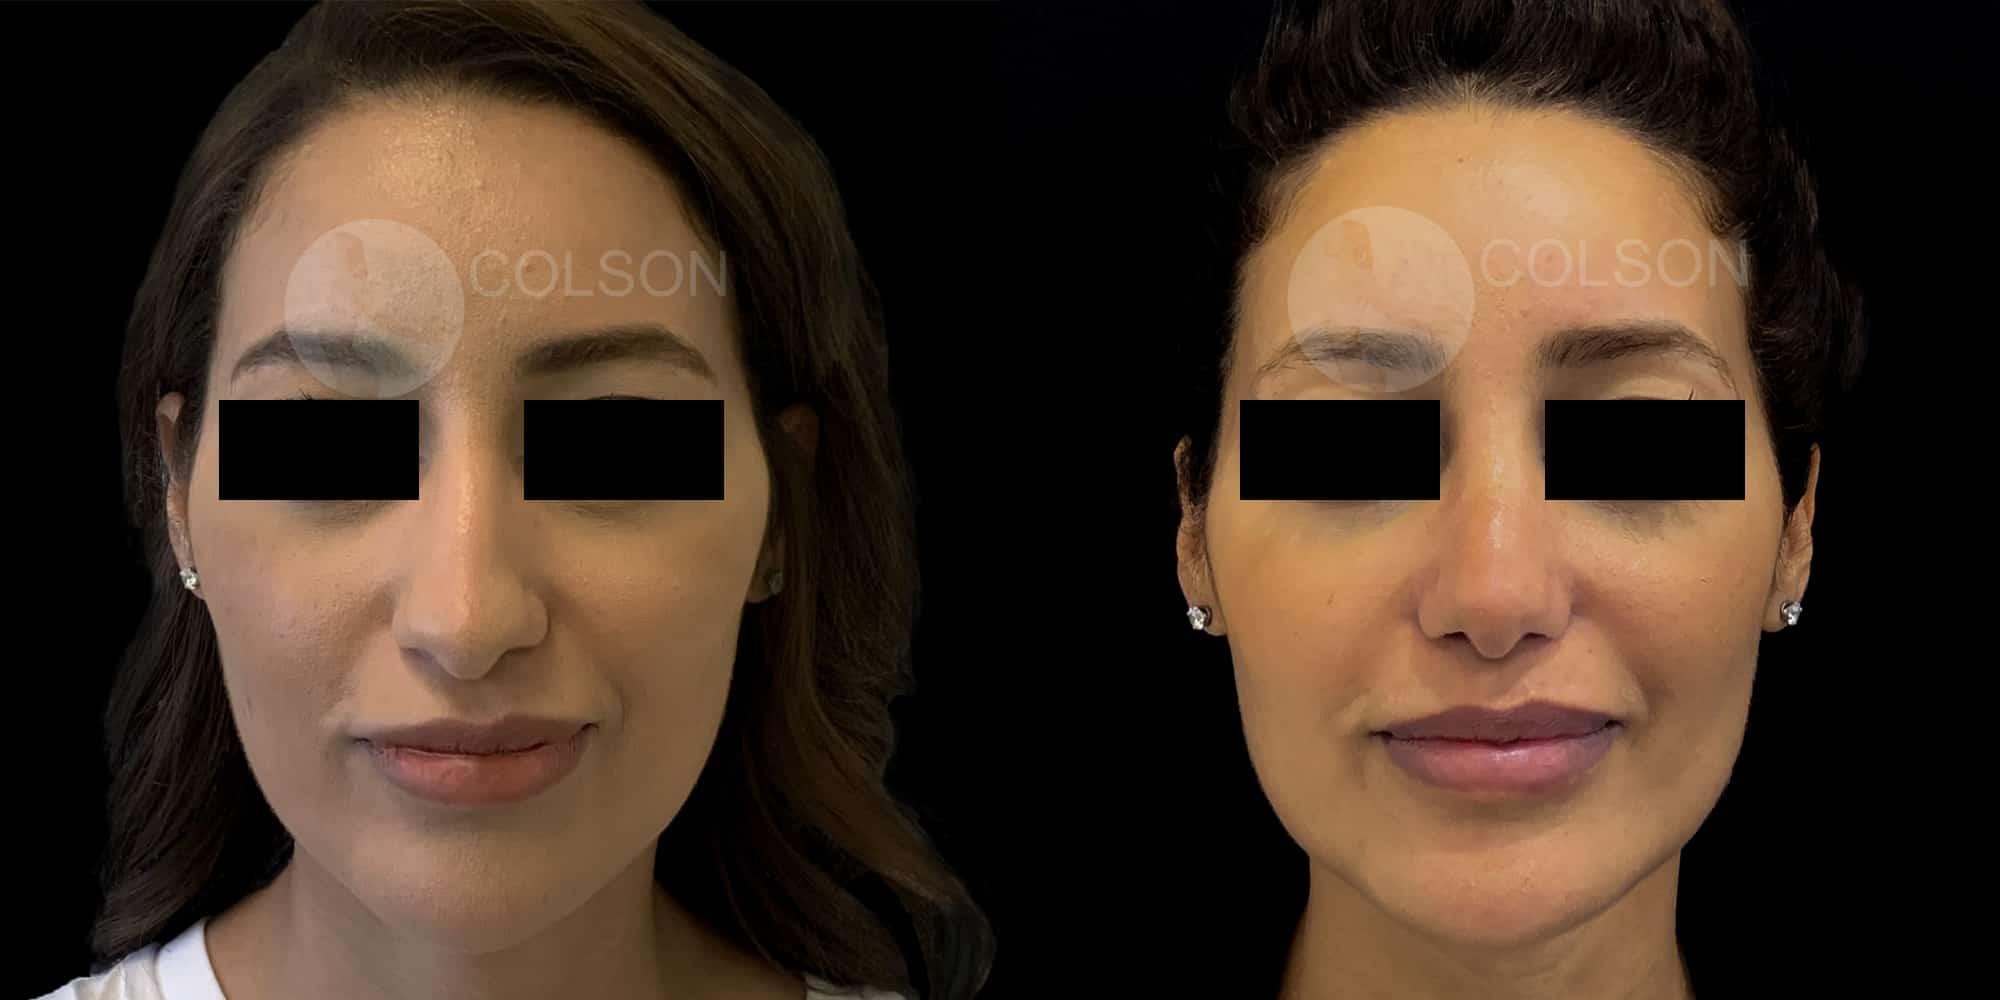 Dr Colson - Chirurgie visage - Rhinoplastie Face